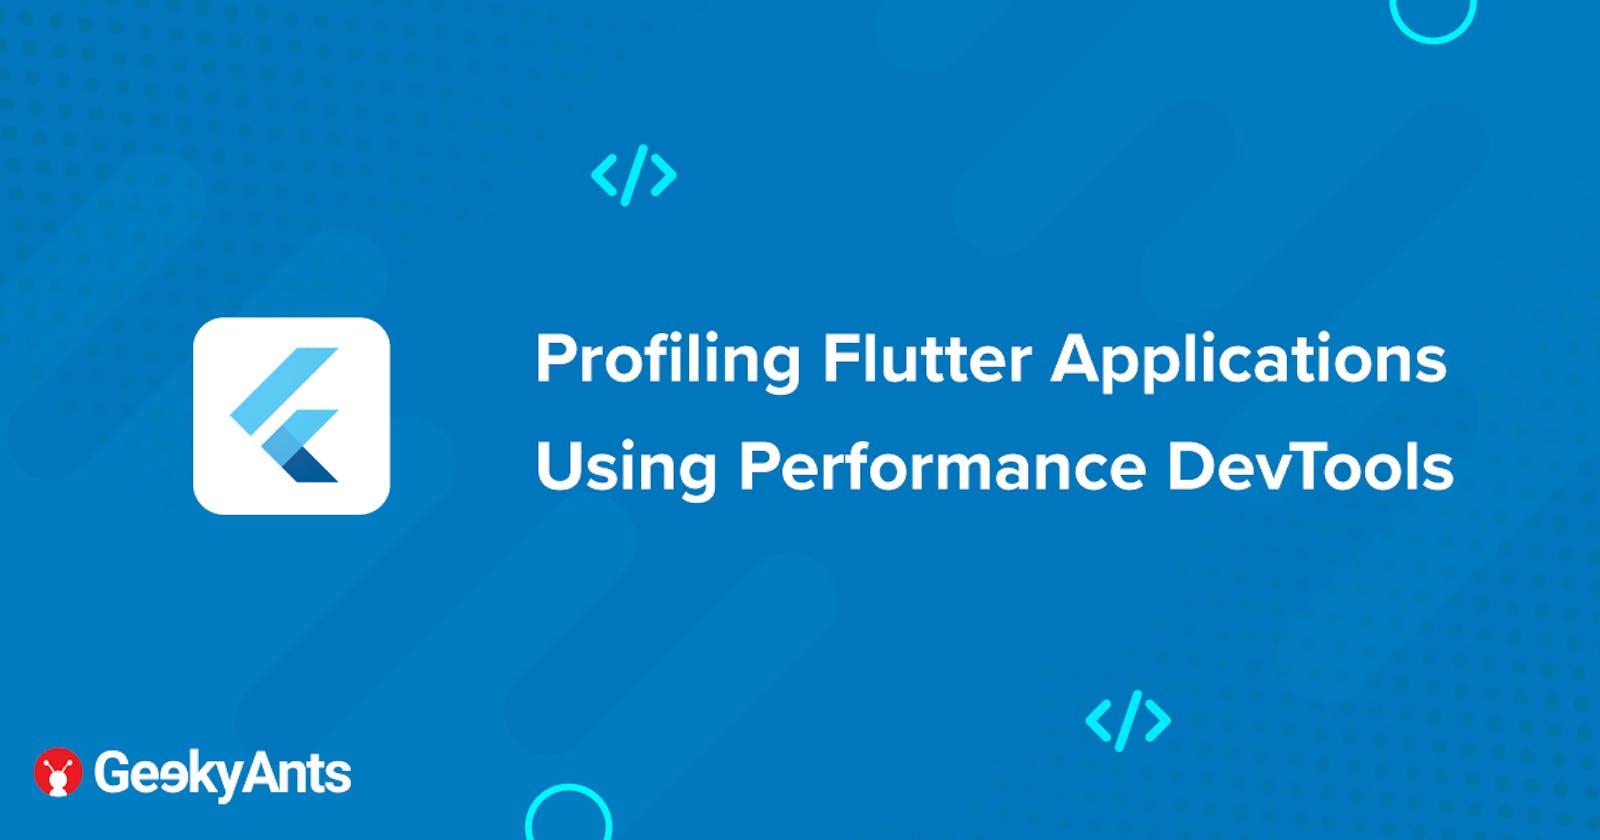 Profiling Flutter Applications Using Performance DevTools